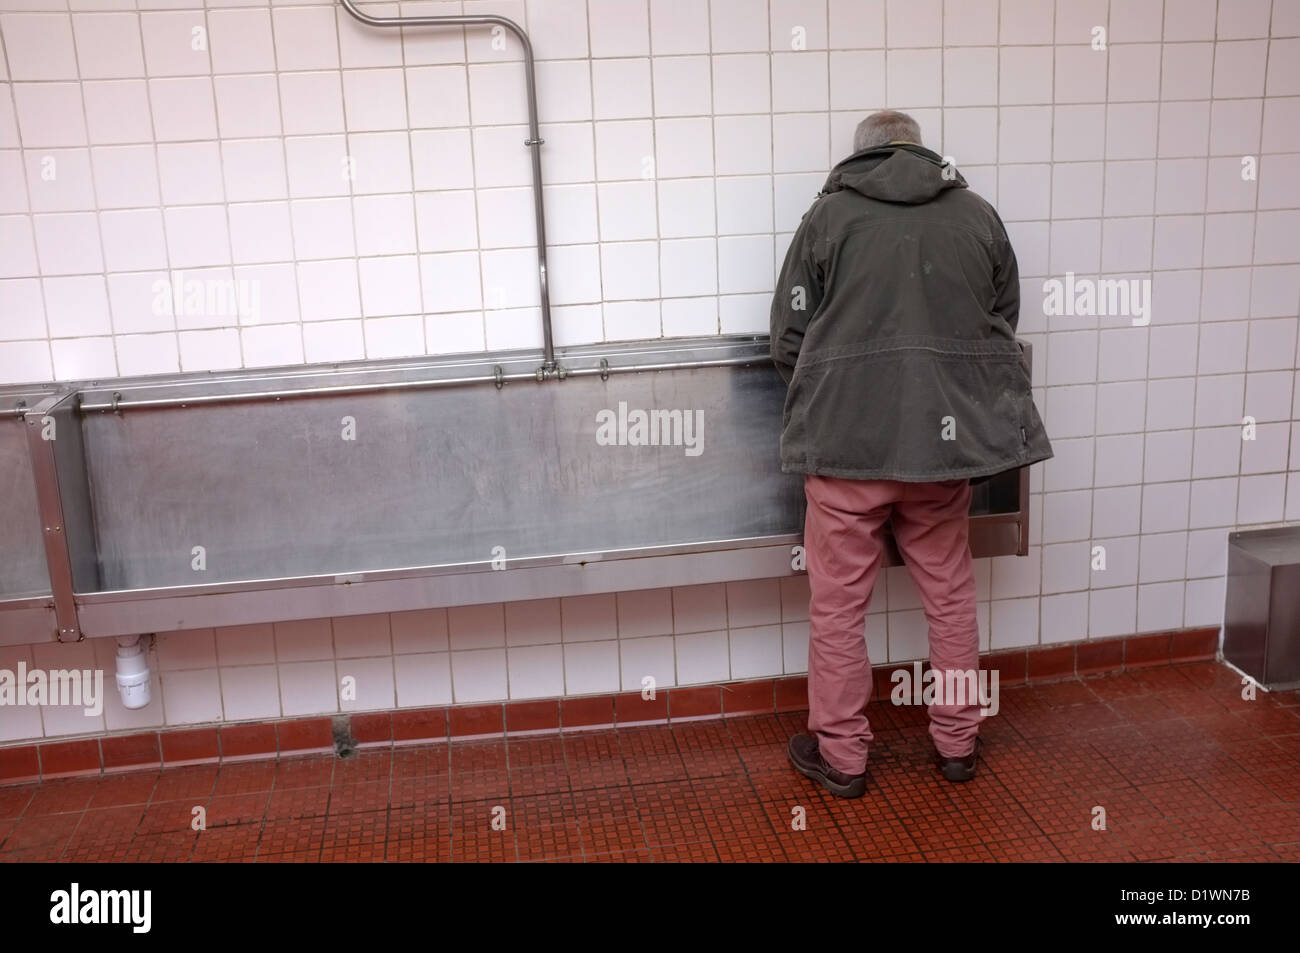 A Man Using Urinal